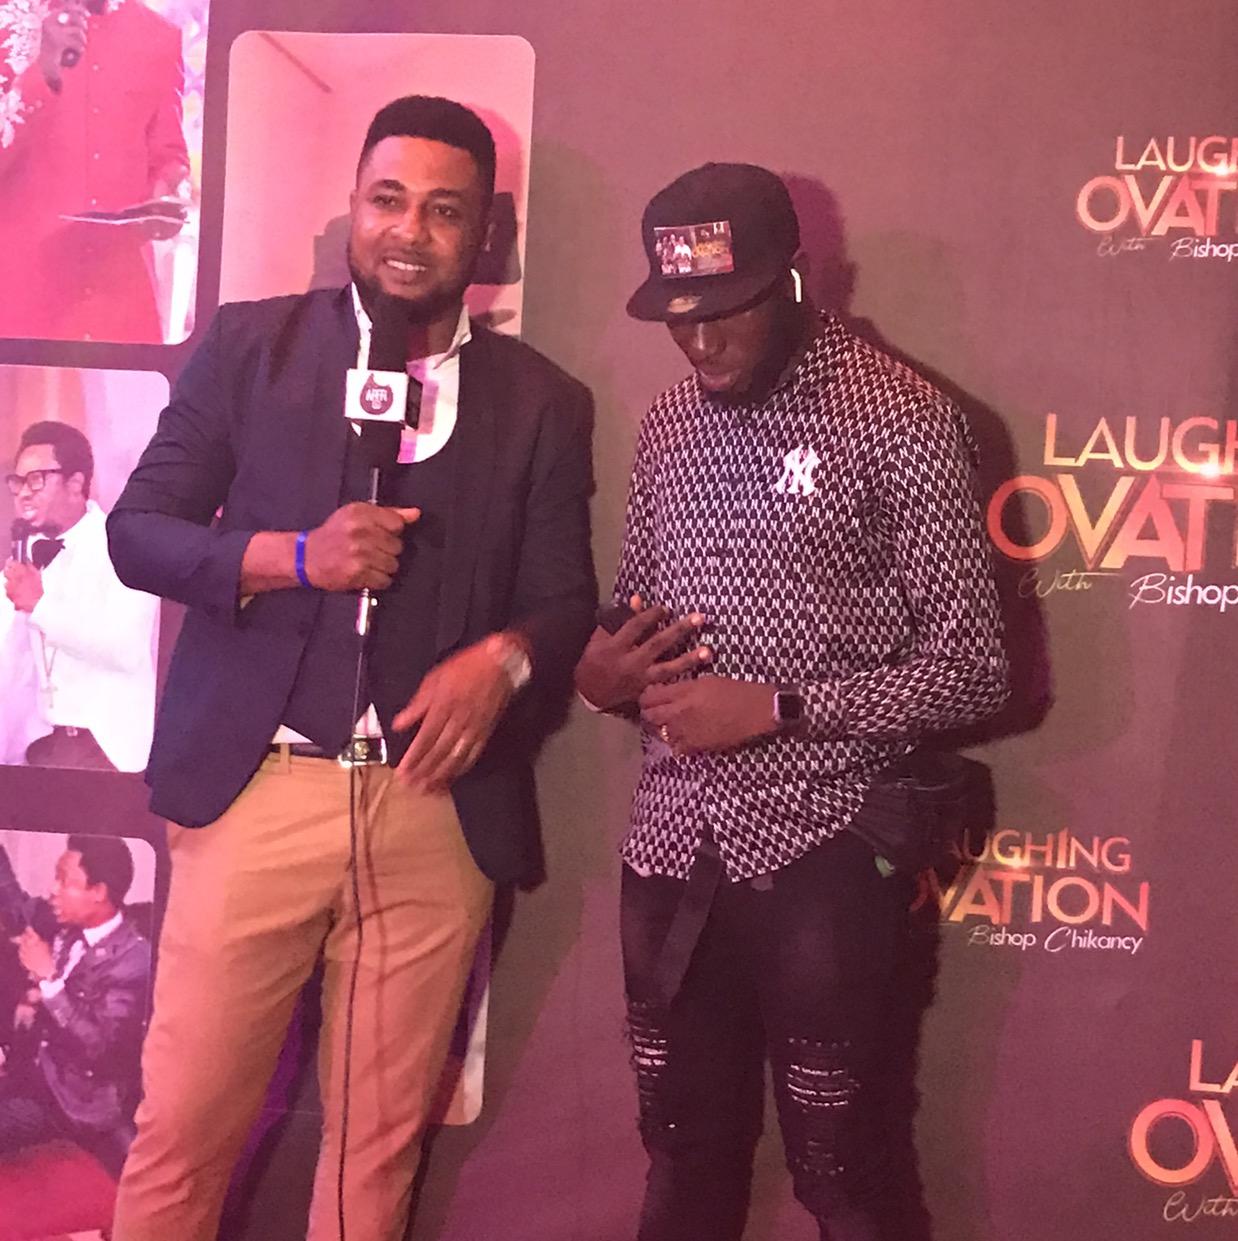 Laughing Ovation with @bishopchikancy Warri